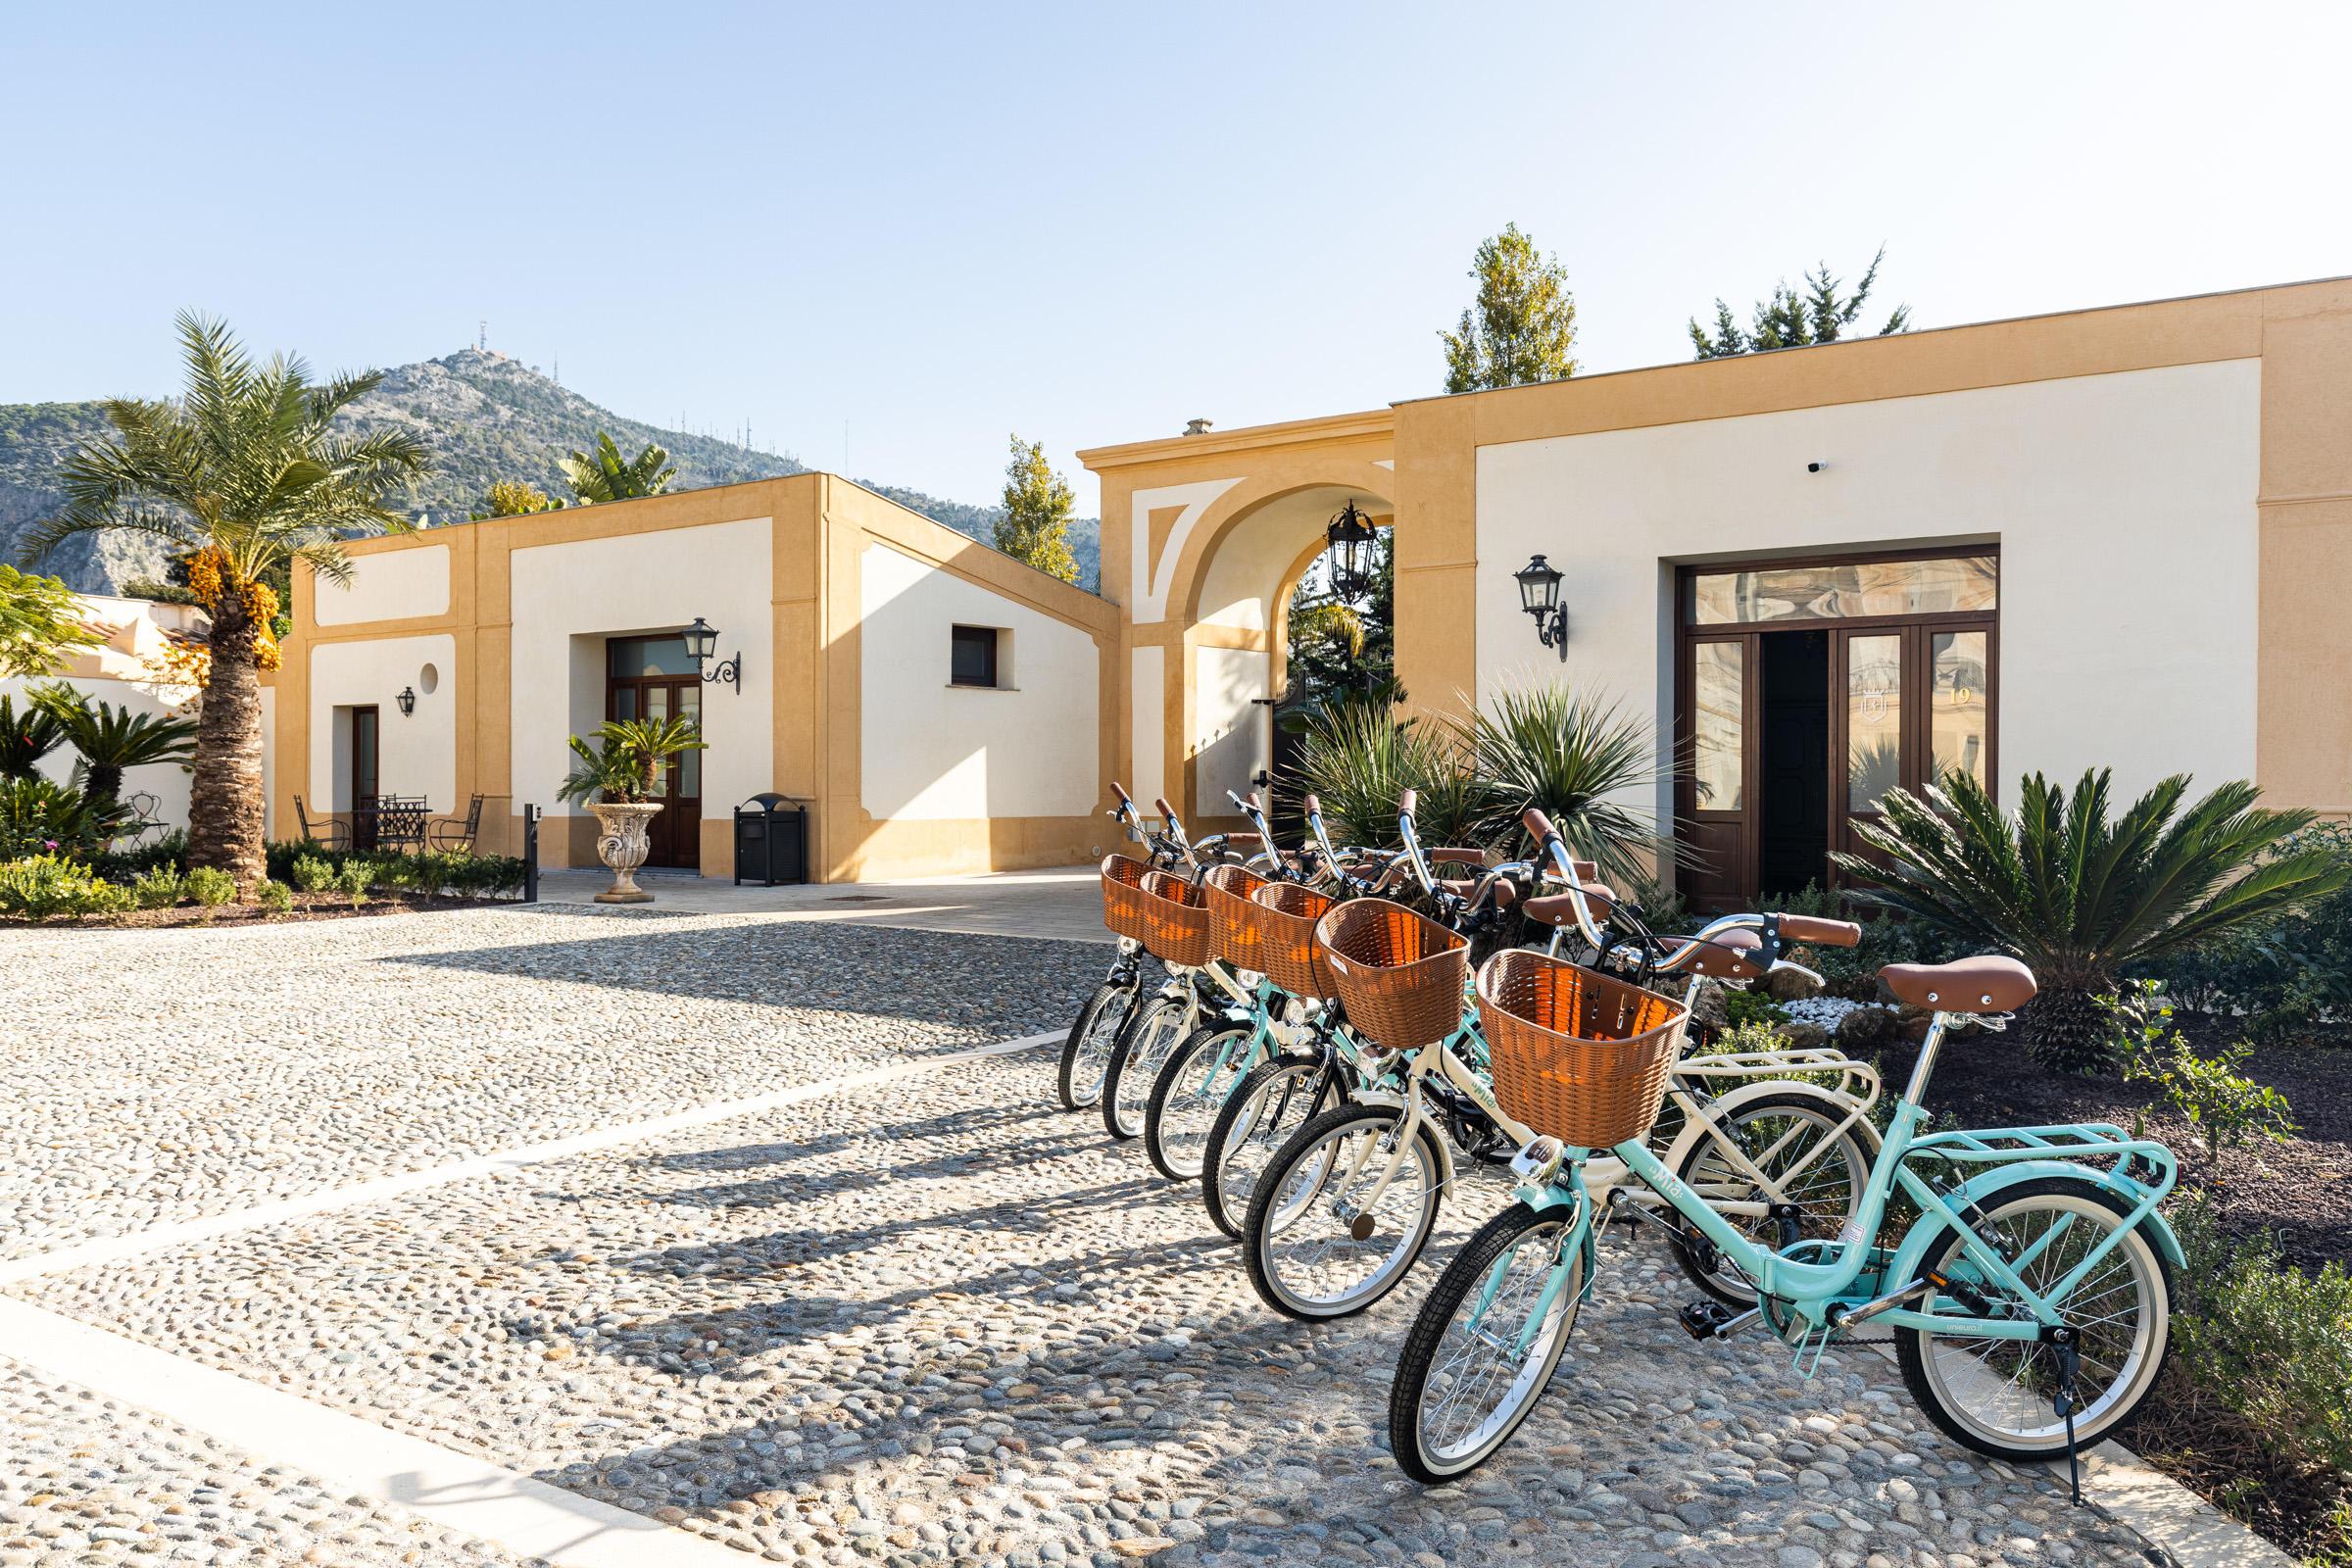 Bici Villa Lampedusa